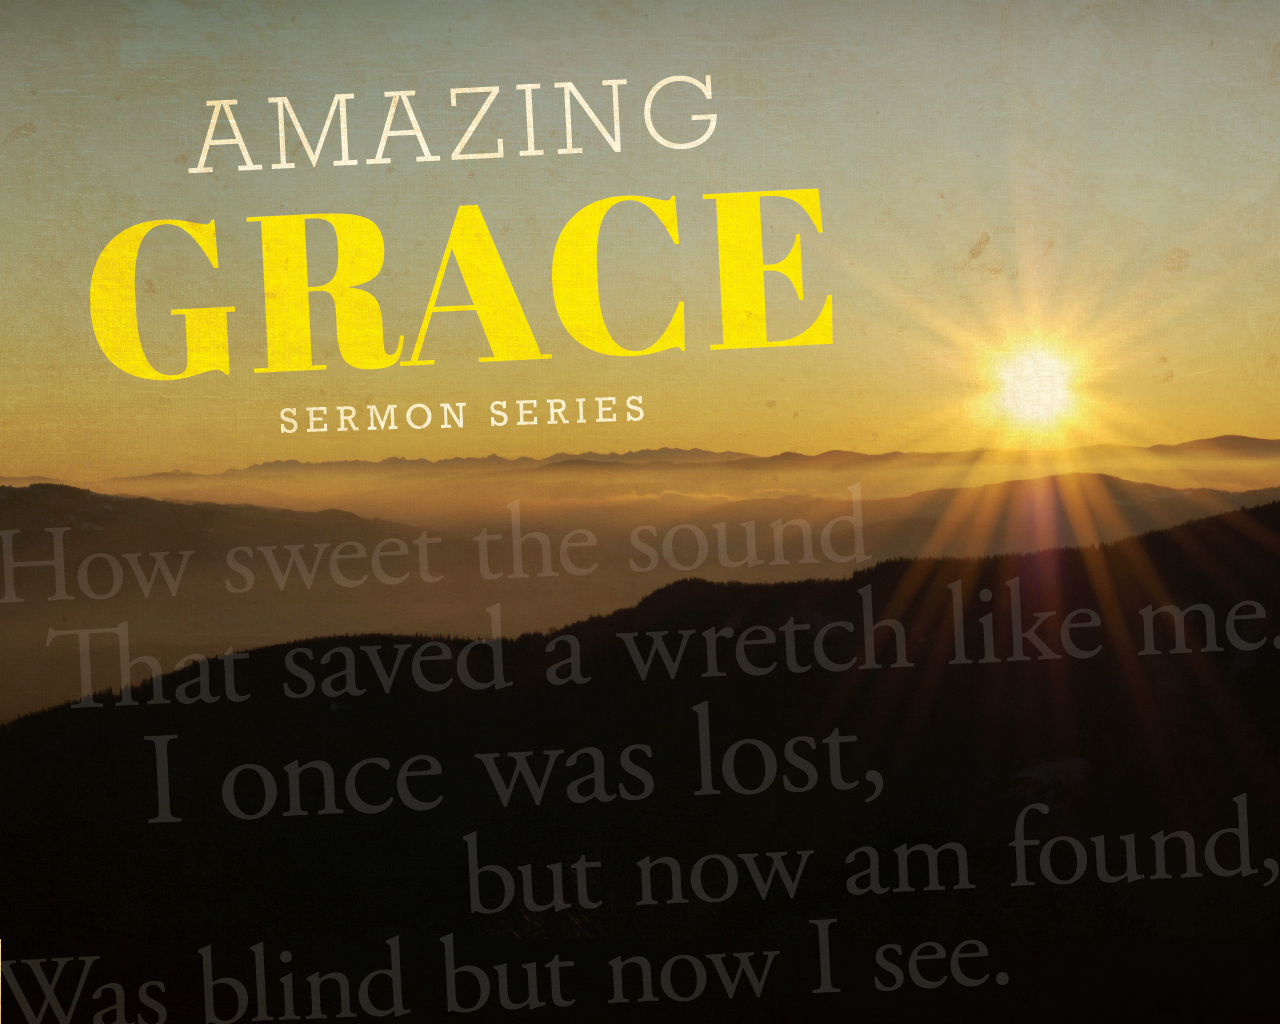 RIDGECREST BAPTIST CHURCH Amazing Grace Wallpaper 1280x1024